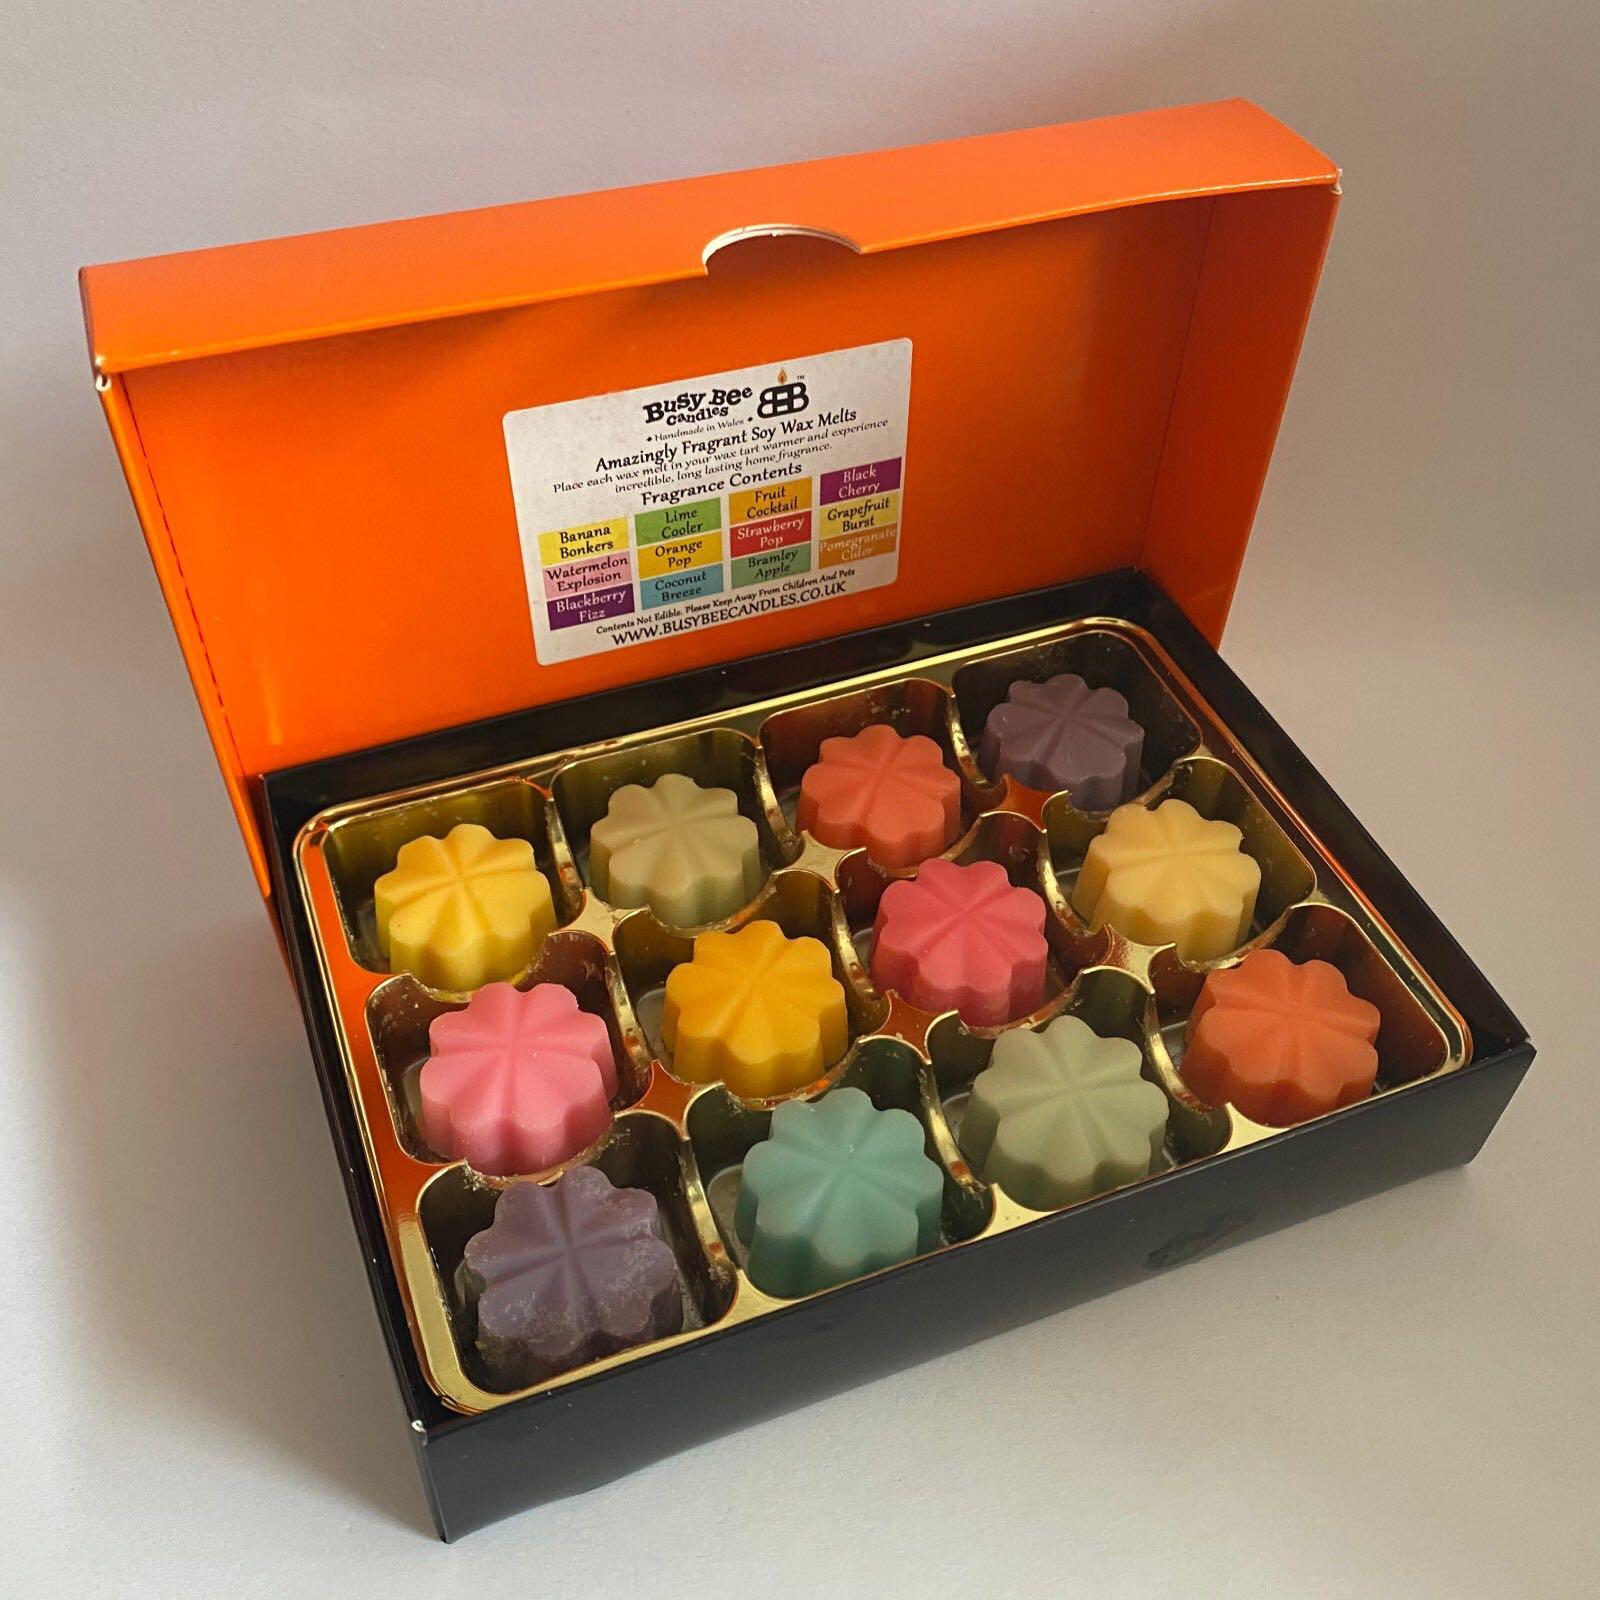 'Fruity' Wax Melt Selection Box (Was £12.00)